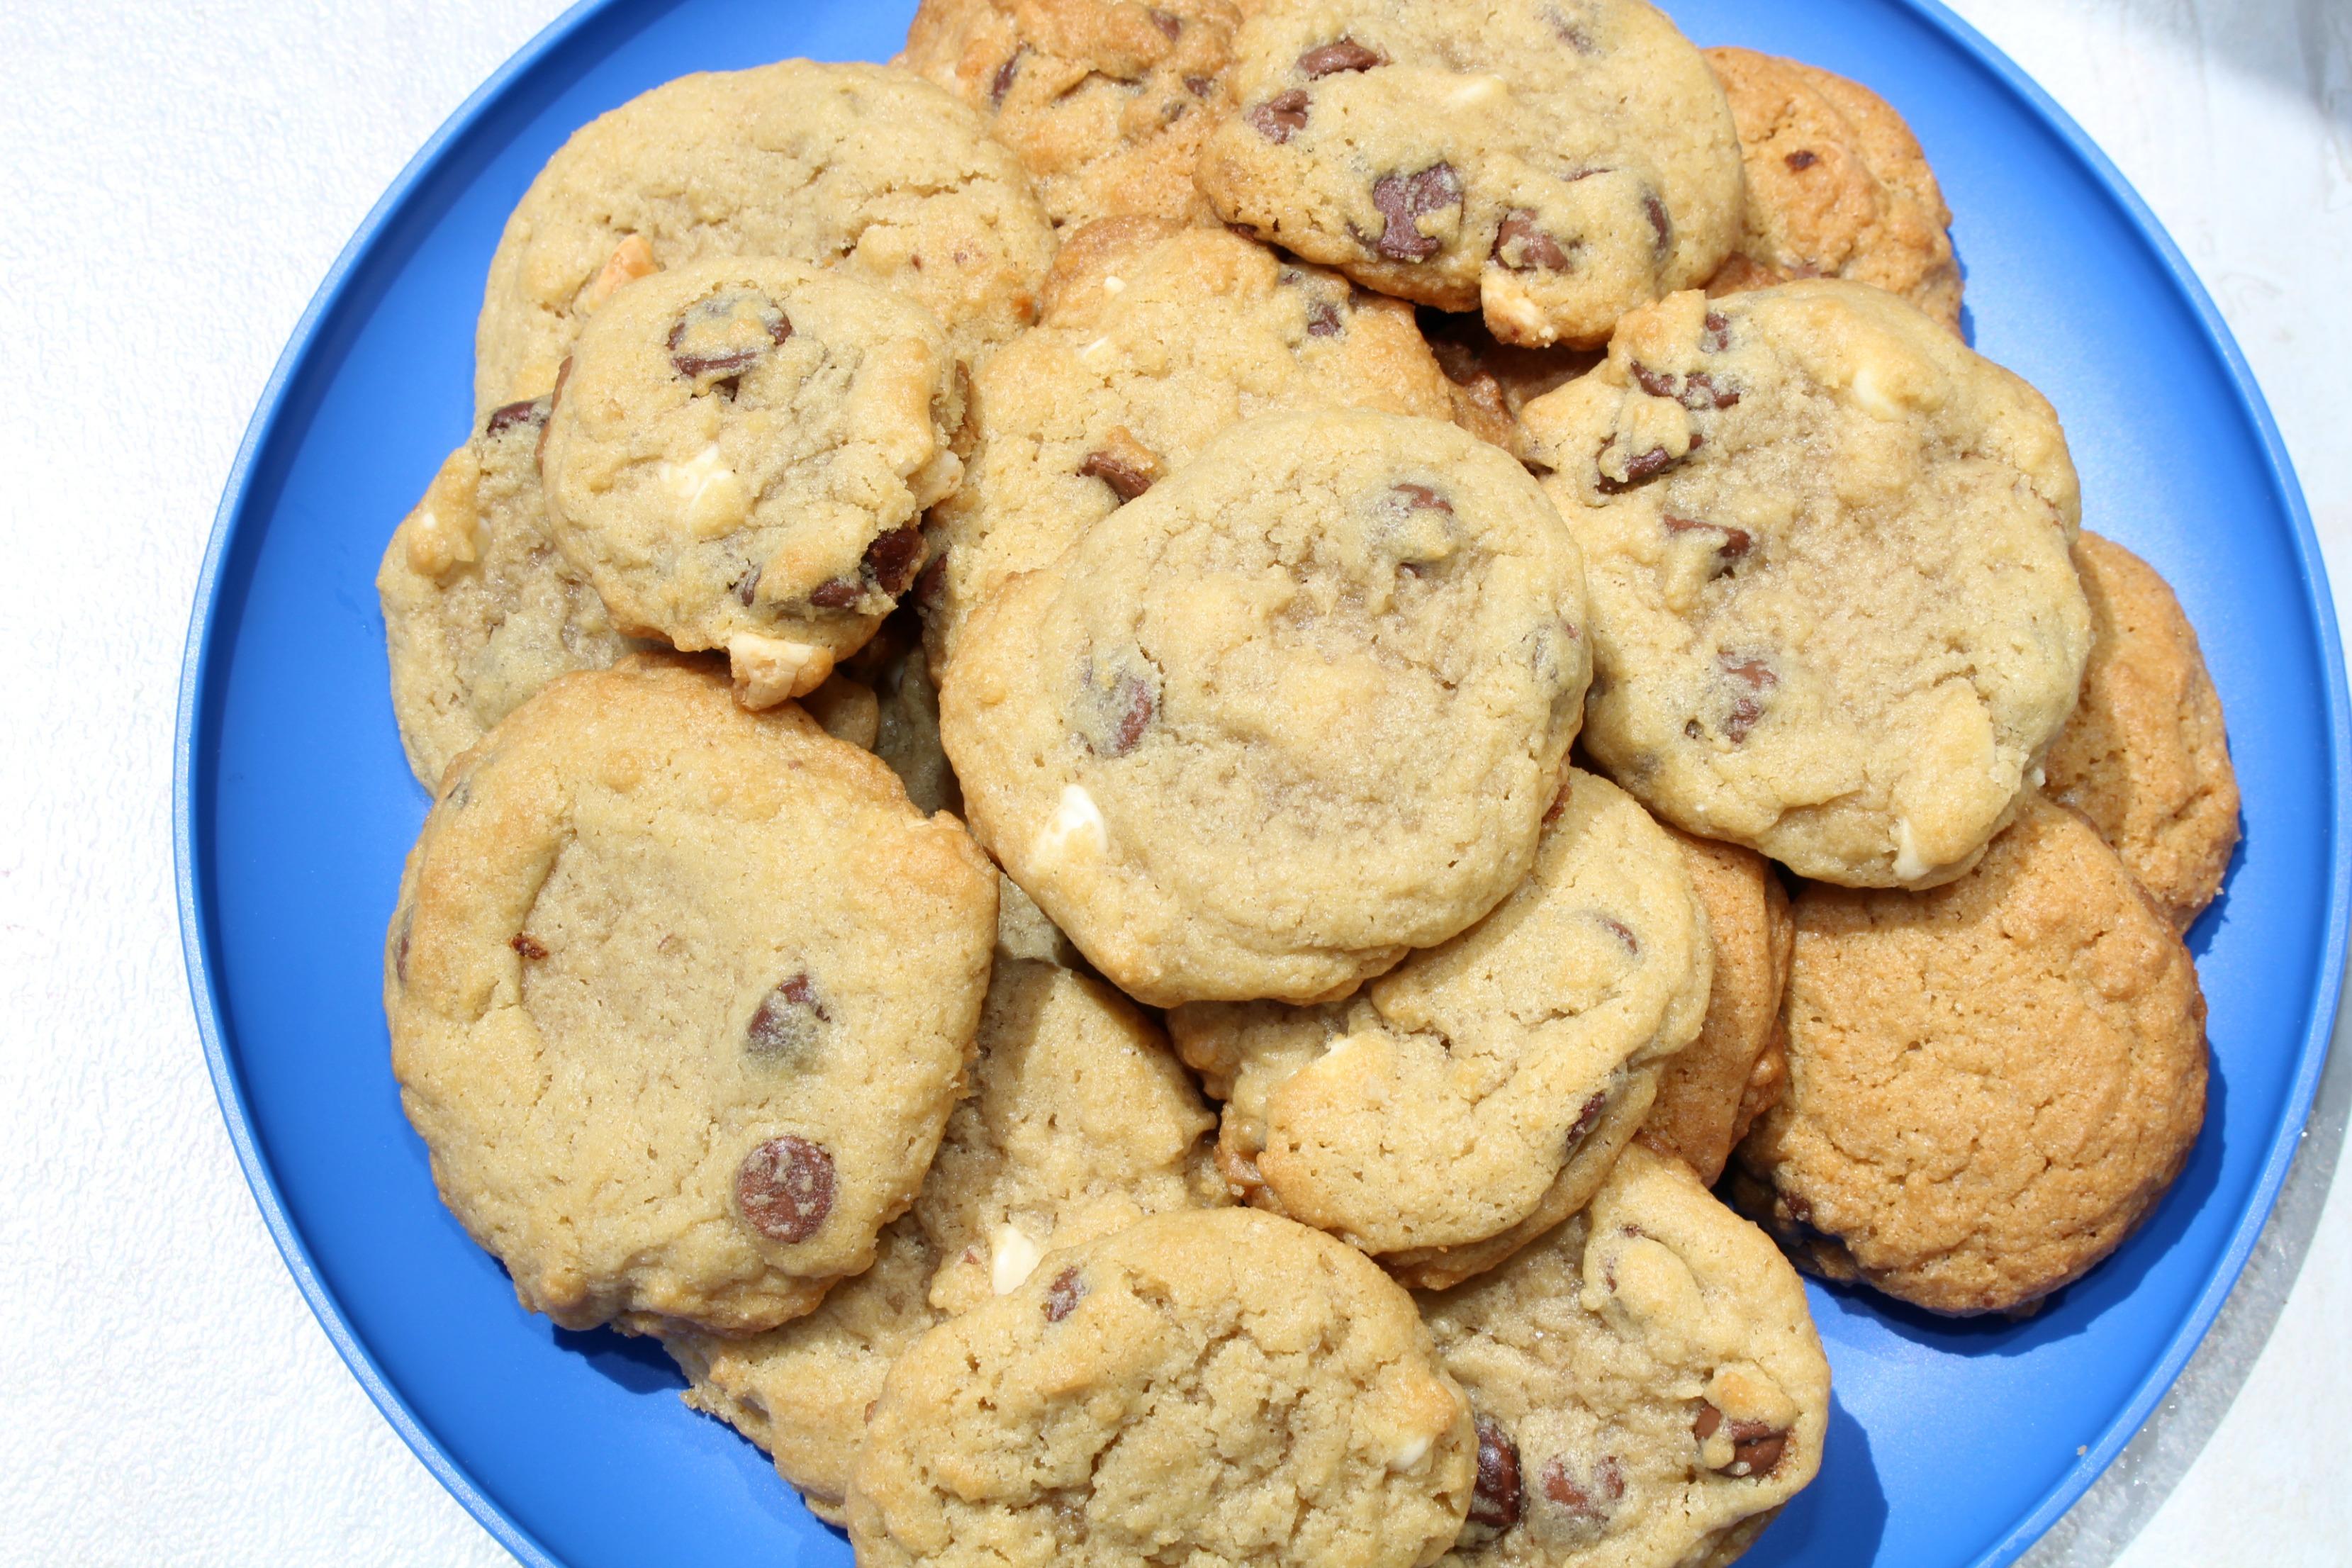 Triple Chocolate Chip Cookie Recipe